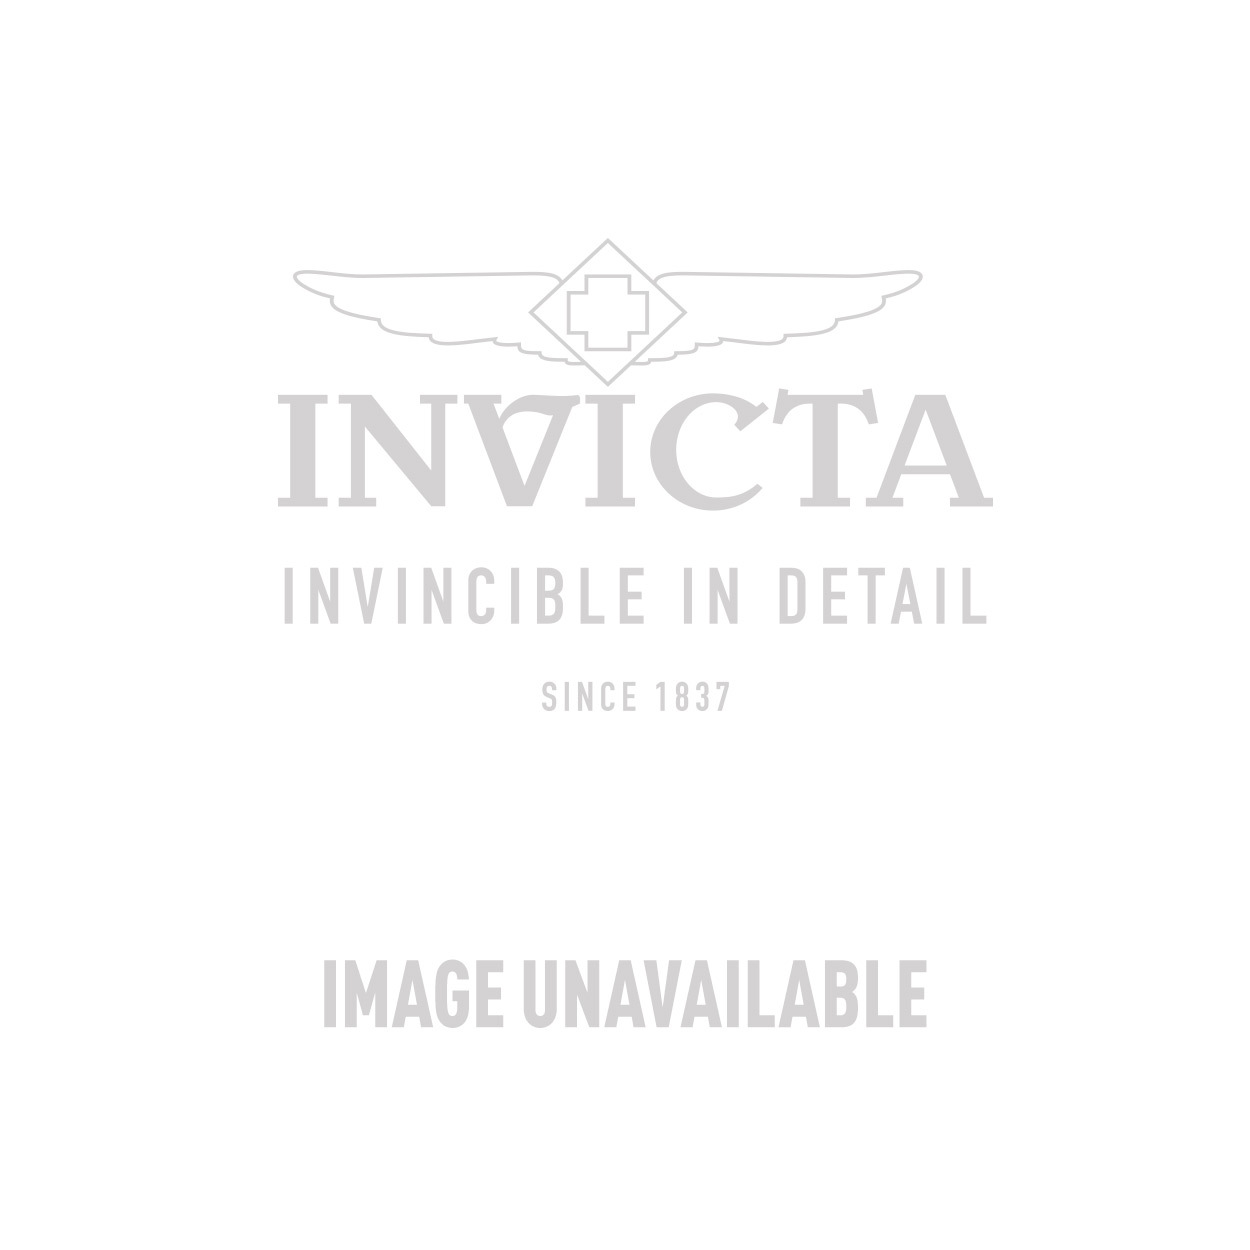 Invicta I-Force Swiss Movement Quartz Watch - Stainless Steel case with White, Orange tone Polyurethane band - Model 11758